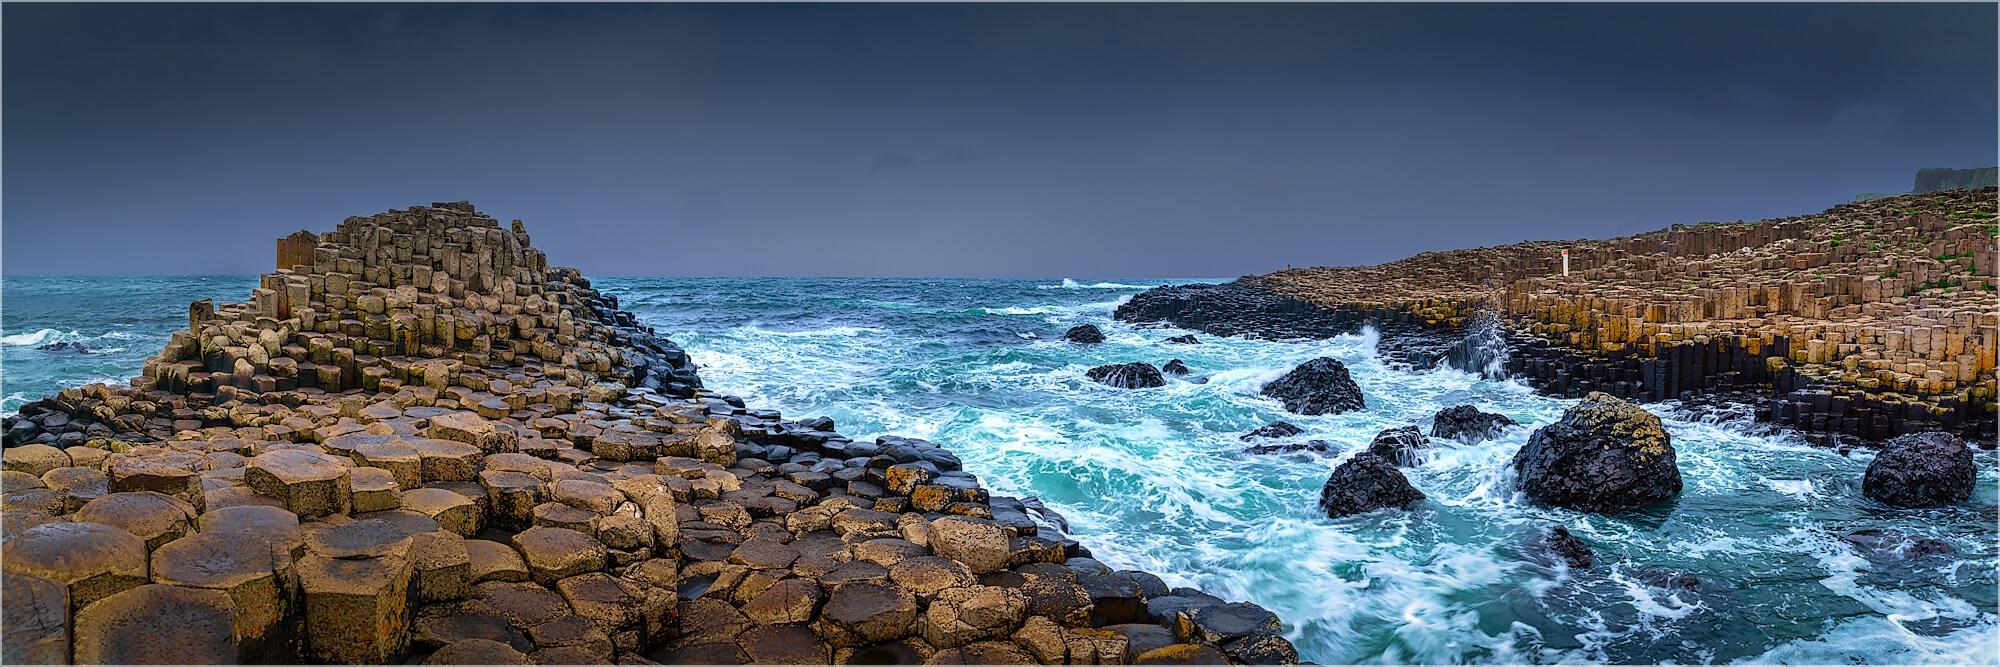 Panoramabild der Giants Causeway in Donegal Irland